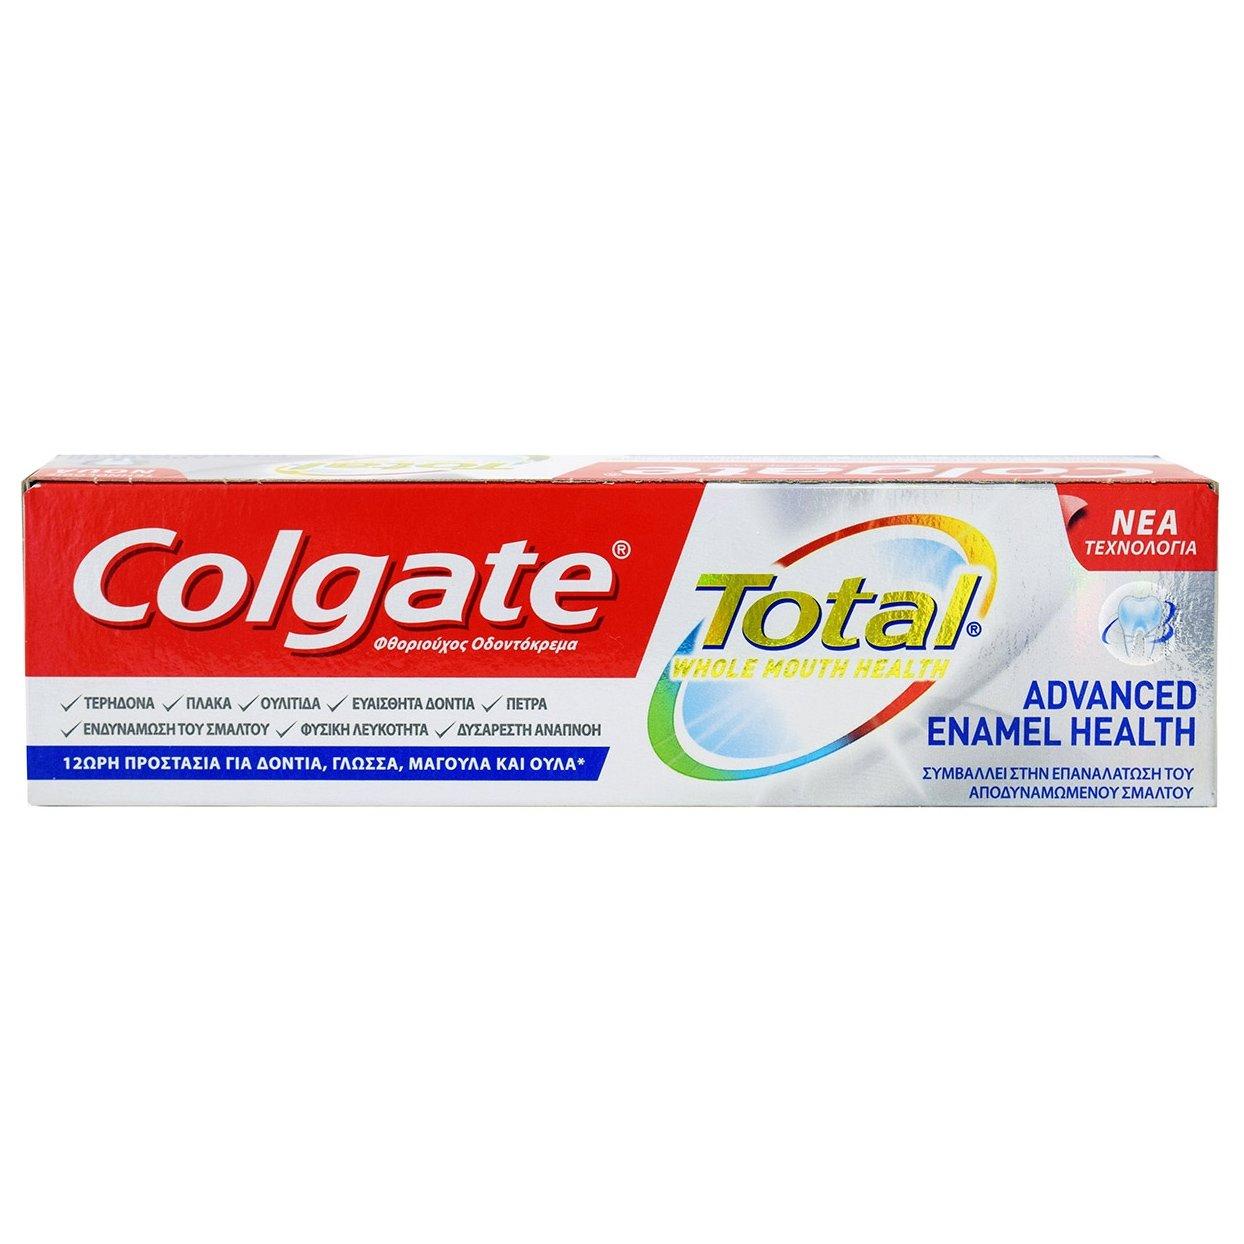 Colgate Total Advanced Enamel Health Οδοντόκρεμα που Συμβάλλει στην στην Αναδόμηση και Αποκατάσταση του Σμάλτου των Δοντιών 75ml